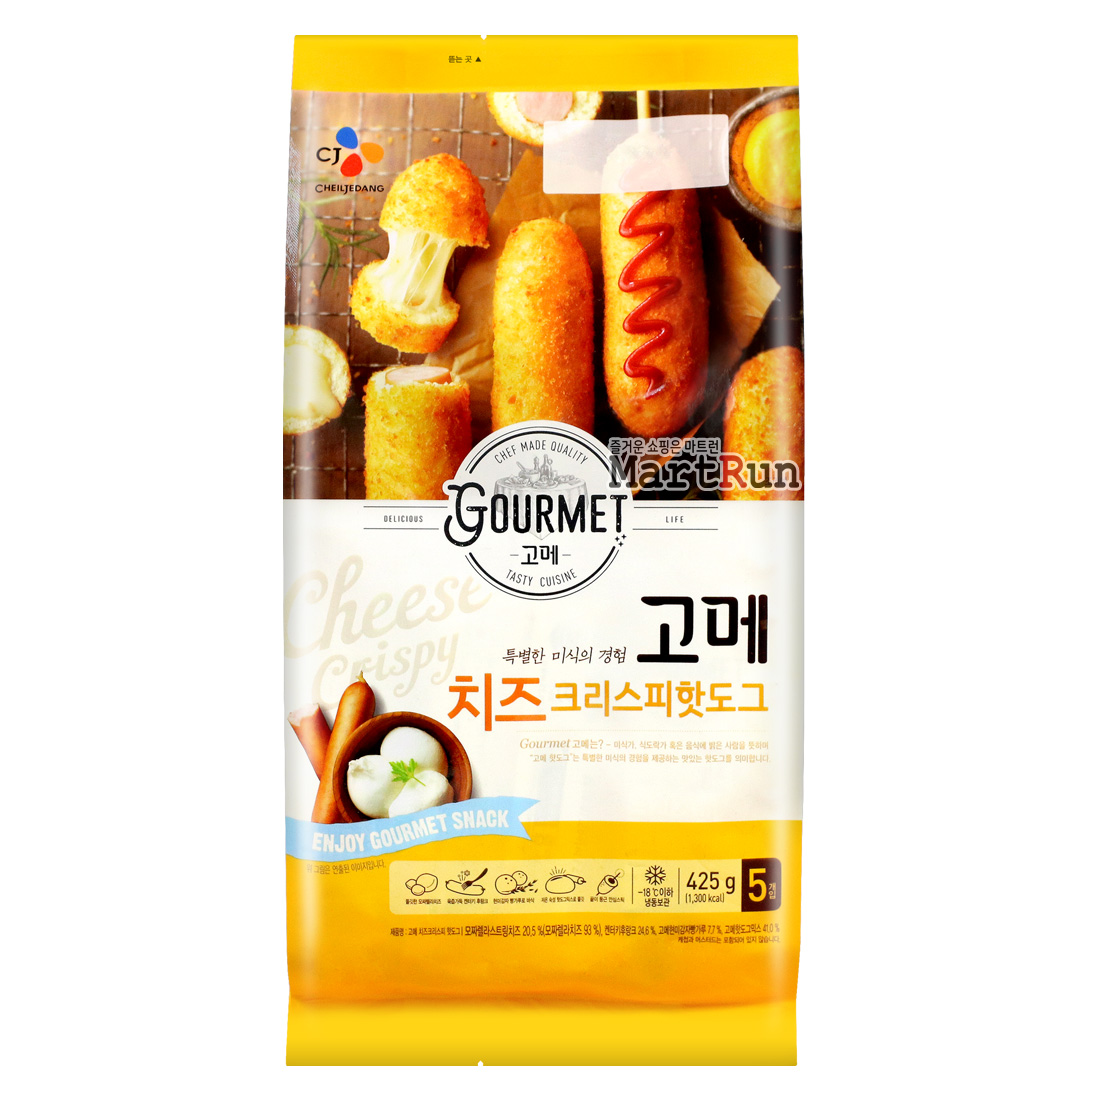 CJ 고메 치즈크리스피 핫도그 425g(5개입) 개별포장, (CJ) 고메 치즈 크리스피 핫도그 425g